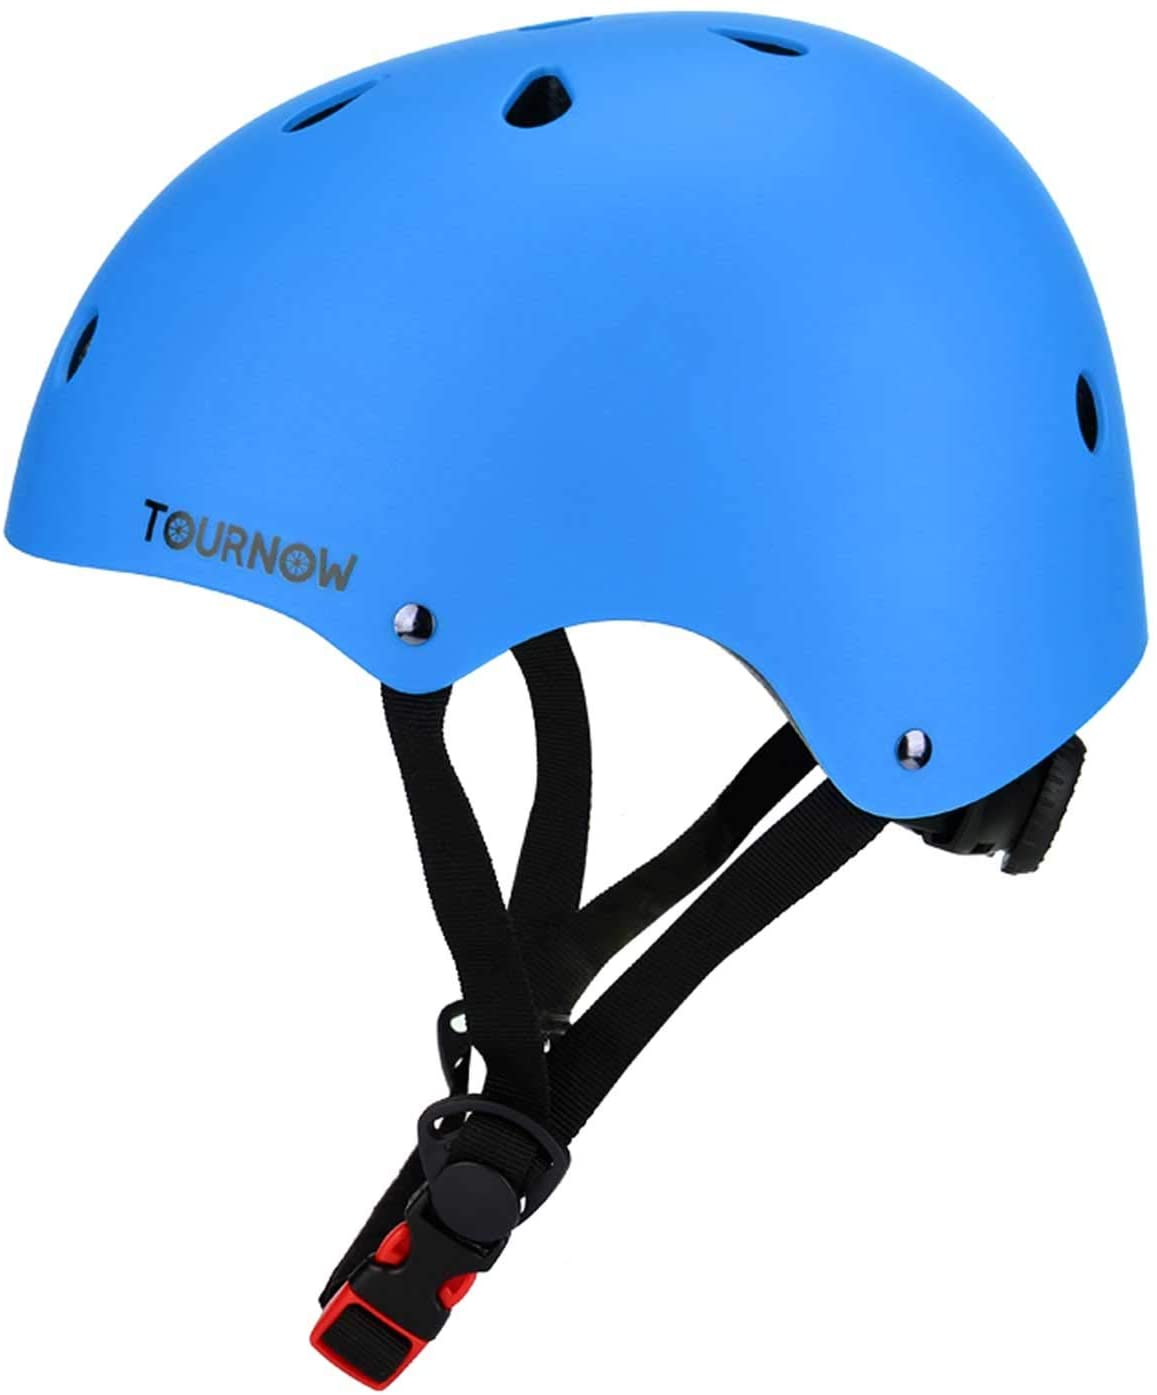 TOURNOW Kids Bike and Skateboard Helmet, 11 Air Vents Adjustable Dial Helmet for Rollerblading Skateboard Cycling Skating Bike Scooter